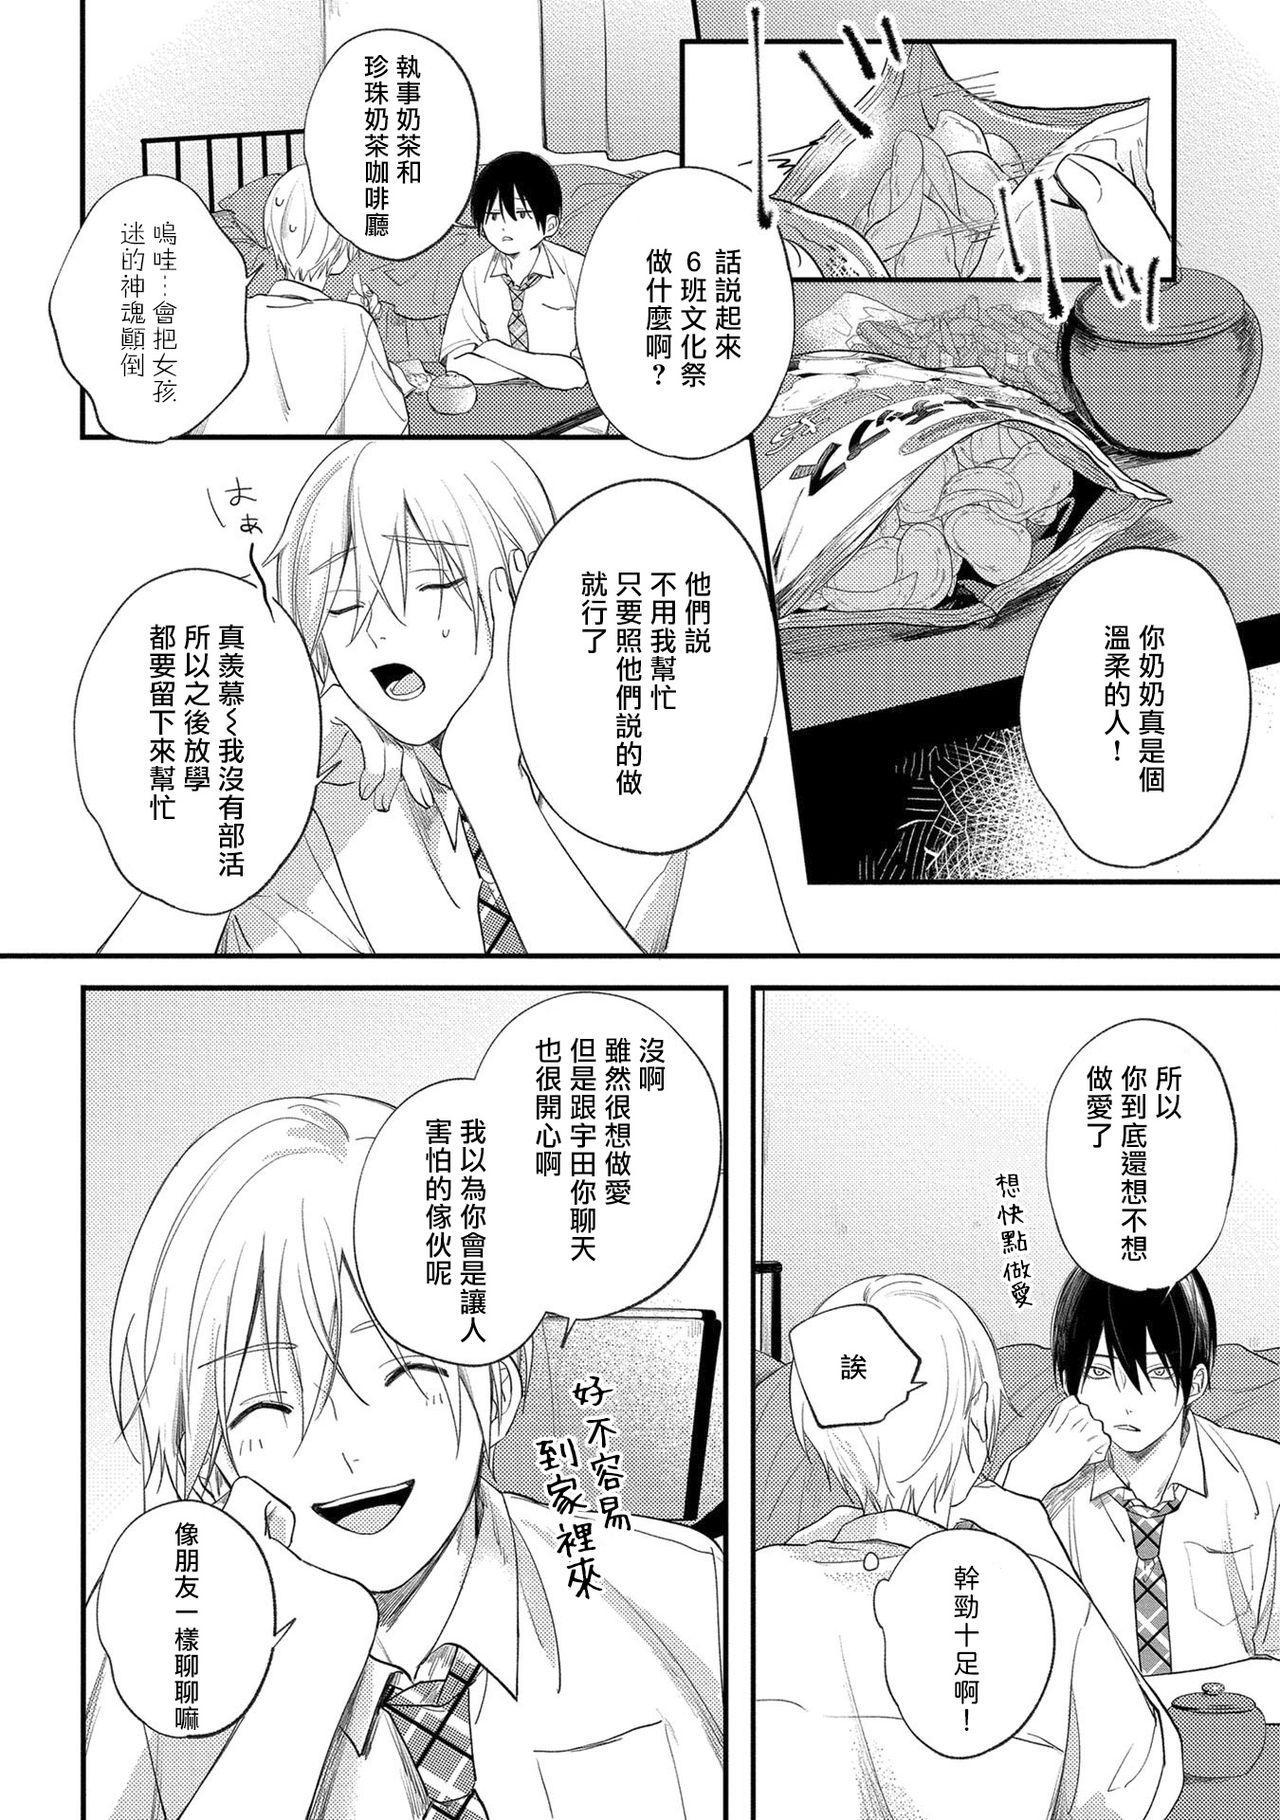 [Utata Hakuto] Houkago Virginity - Virginity afterschool 1-5 完结 [Chinese] [拾荒者汉化组] [Digital] 44